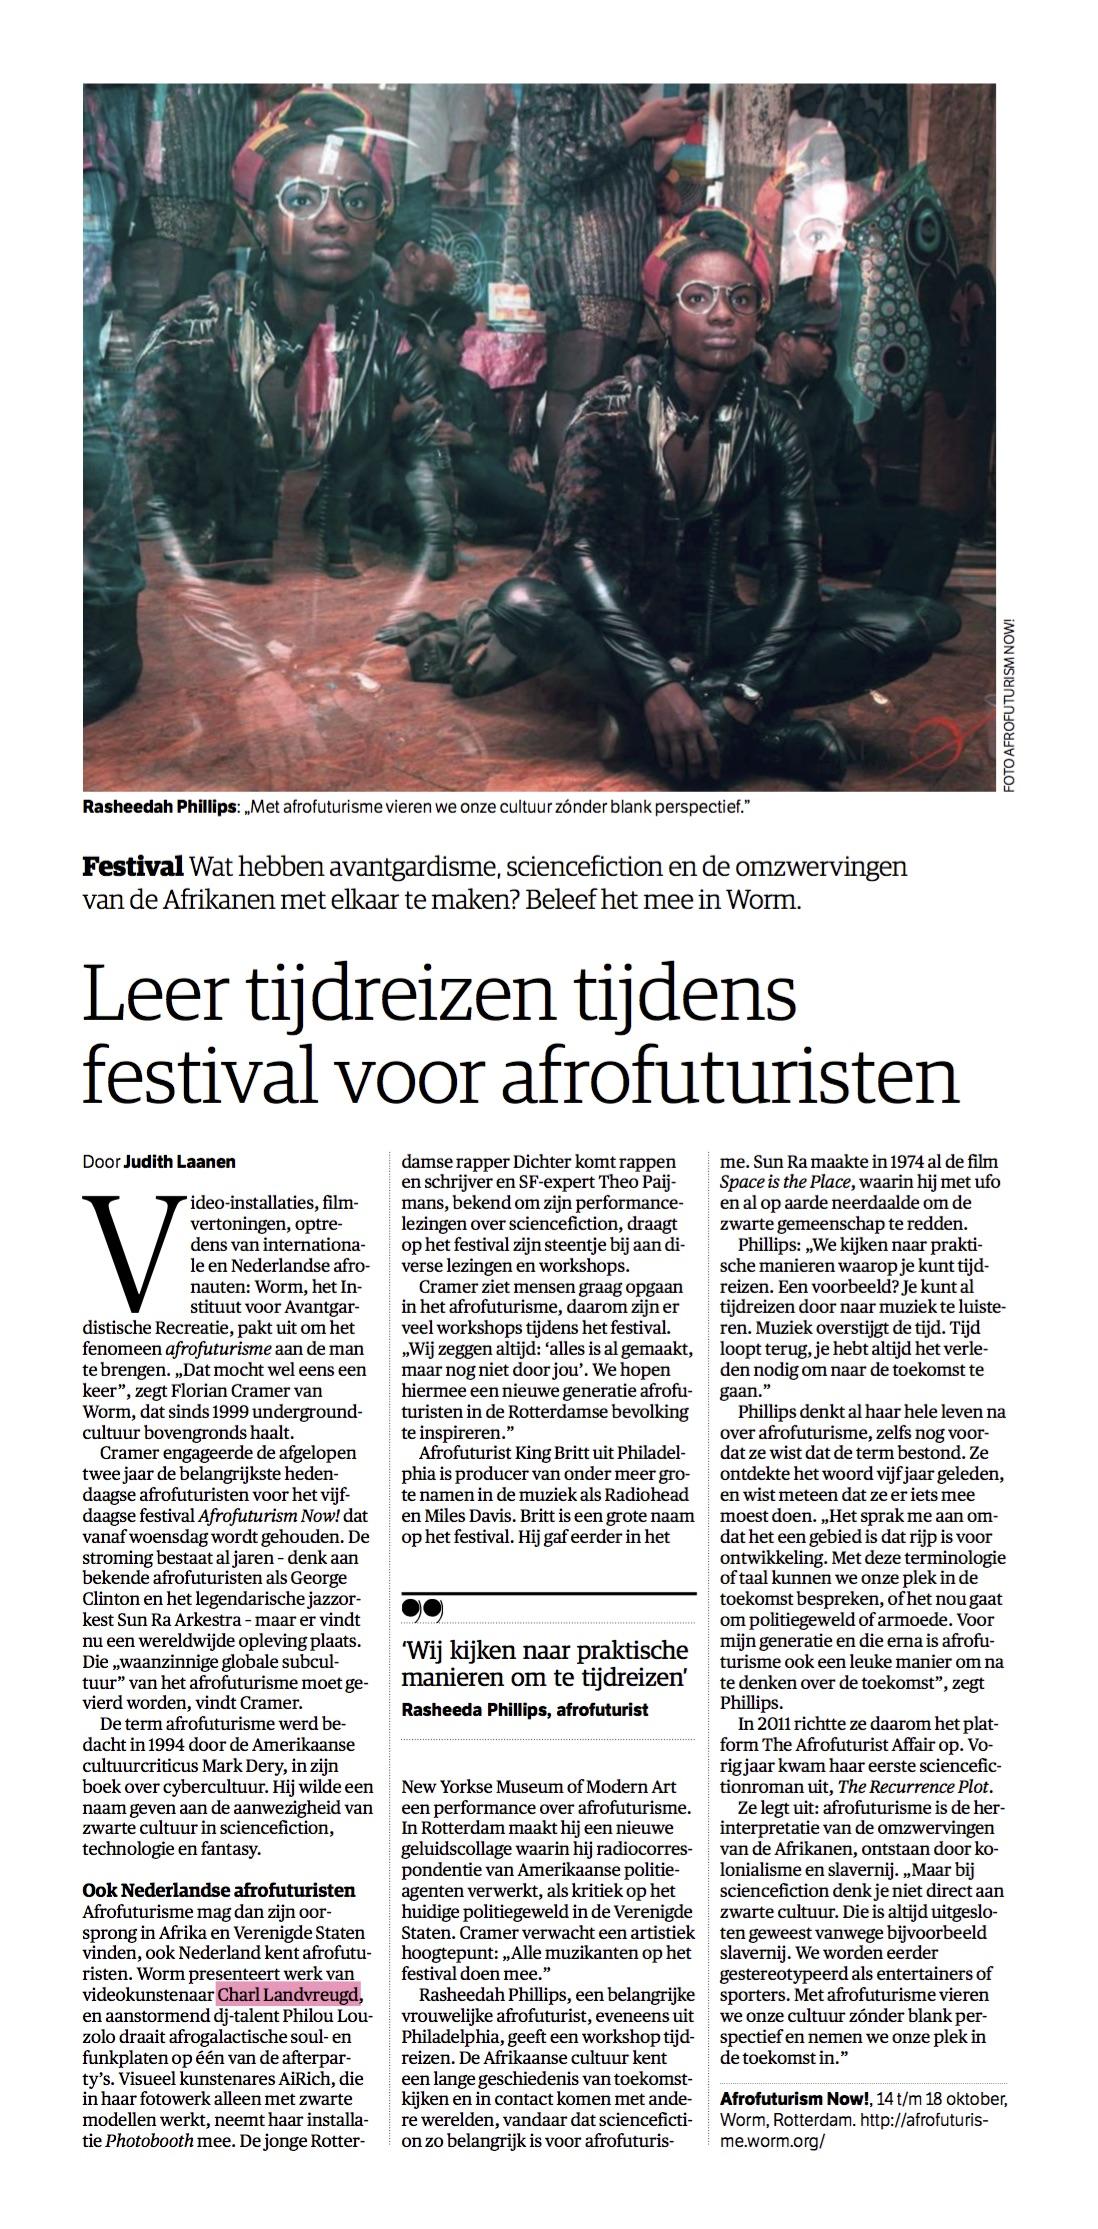 NRC_Handelsblad_20151009_5_08_2.jpg